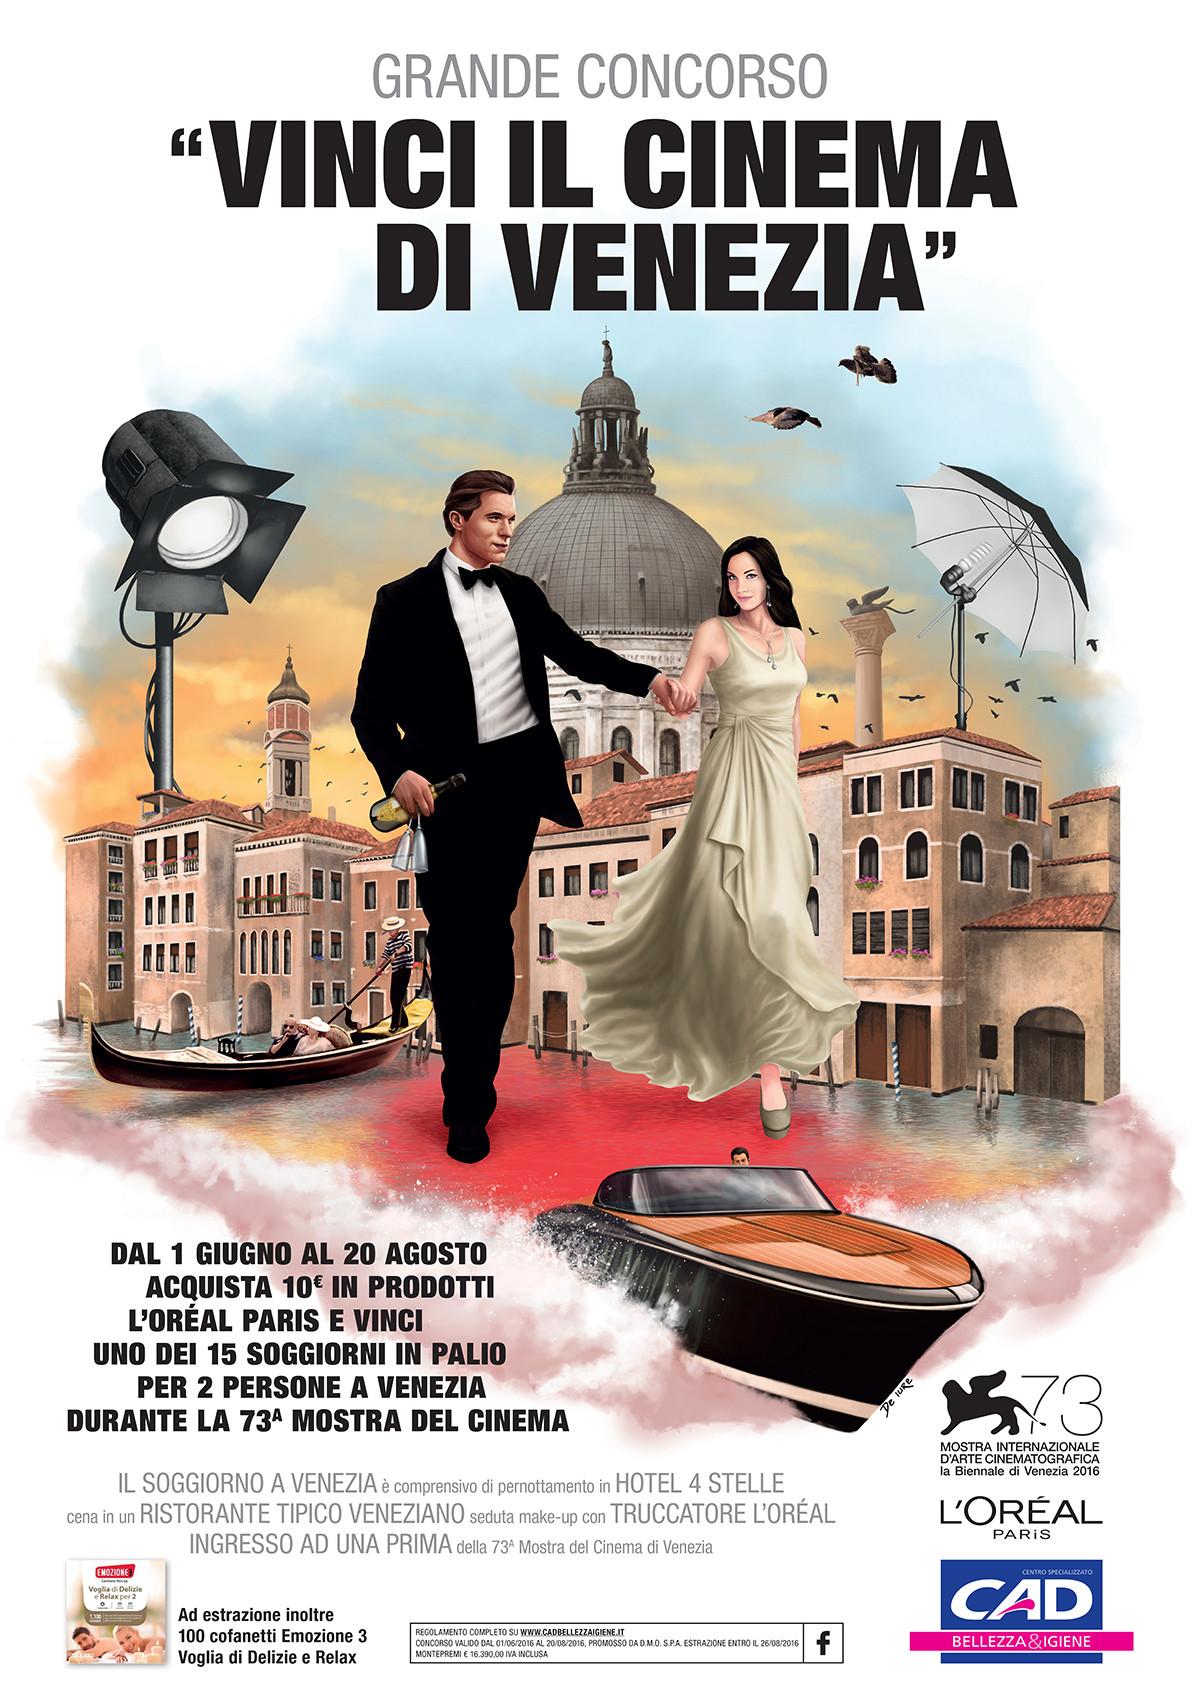 Giuseppe de iure cad cinema venezia giuseppe de iure